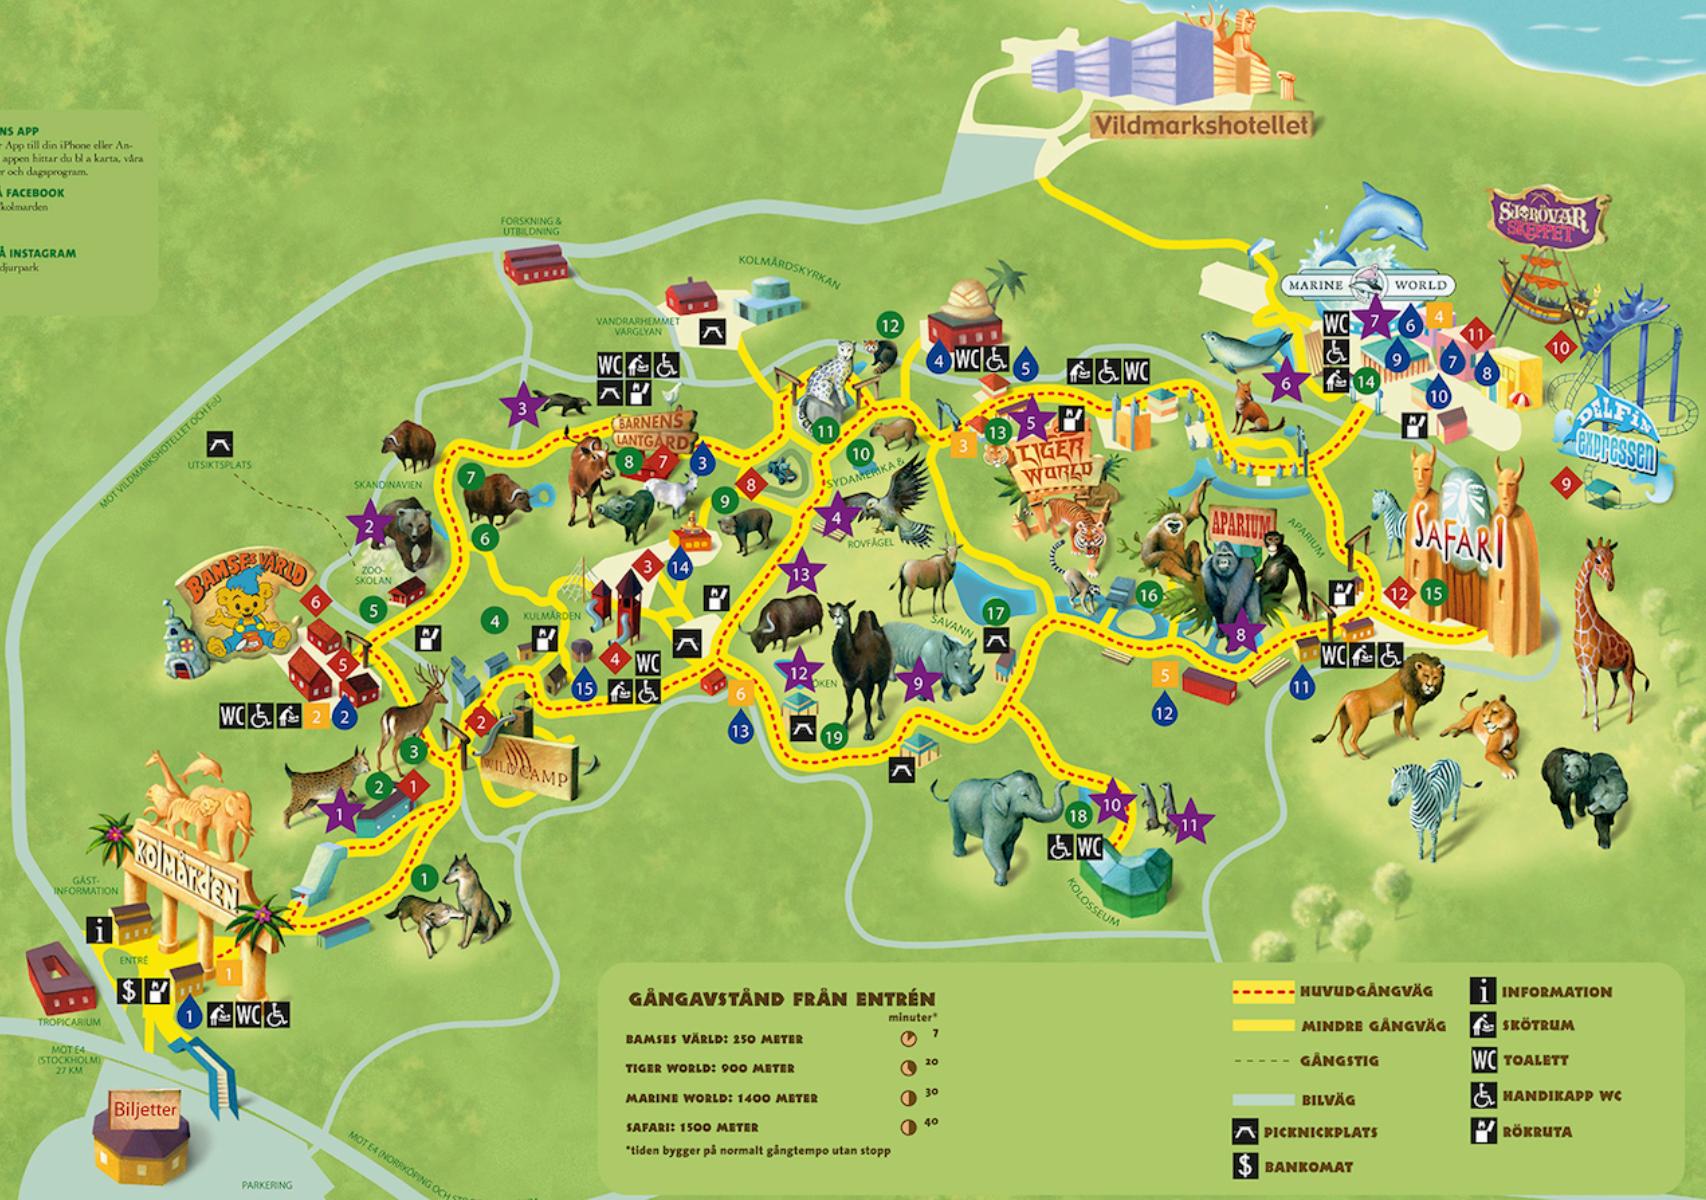 kolmården karta Karta Kolmården | Maps | Pinterest | Zoos kolmården karta